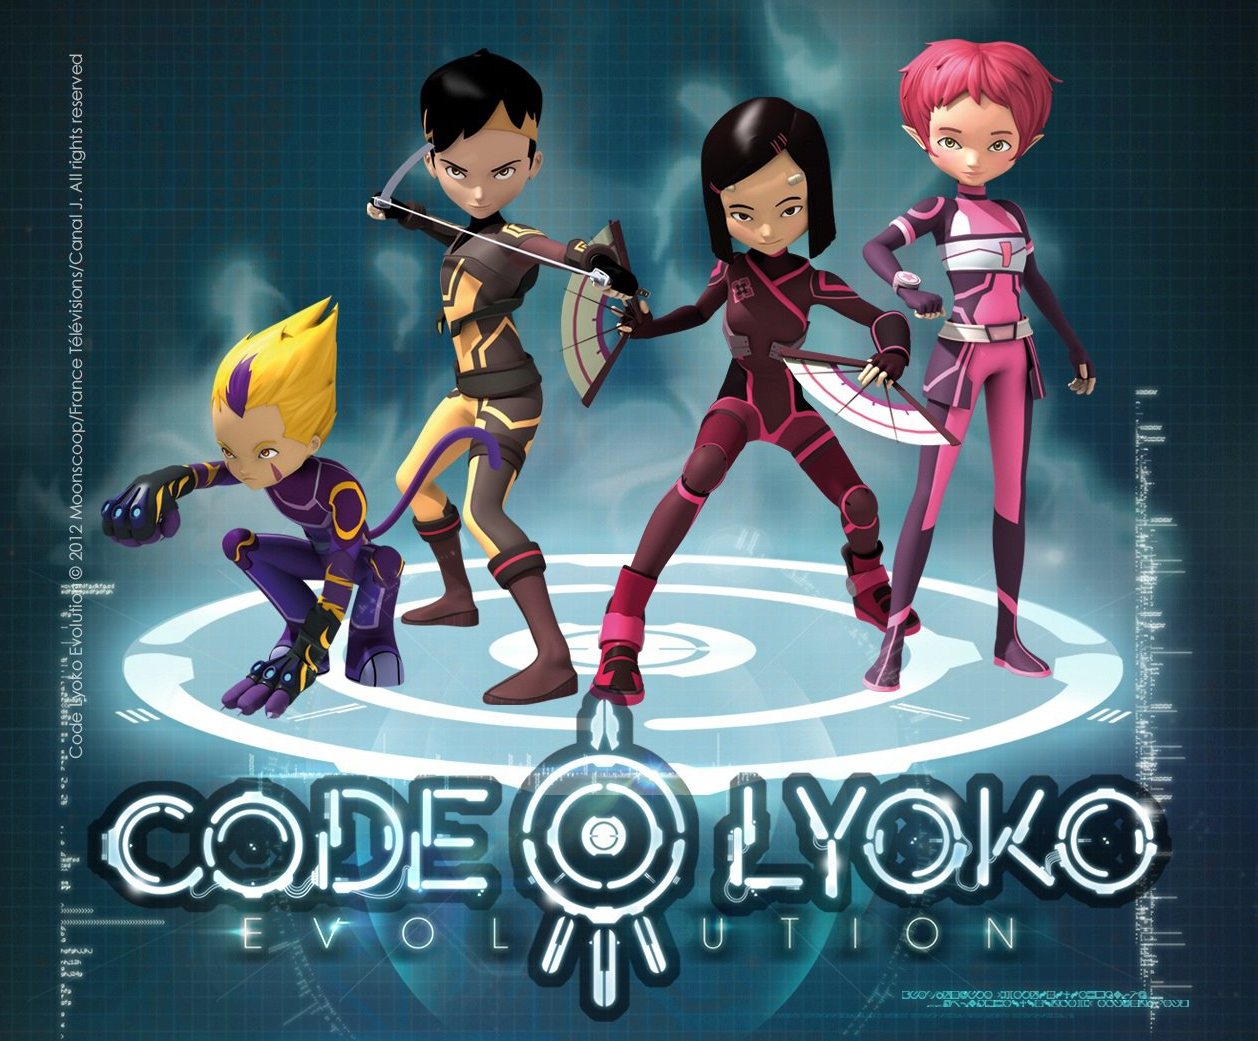 http://images.wikia.com/codelyoko/images/d/de/Code-Lyoko-Evolution_0.jpg